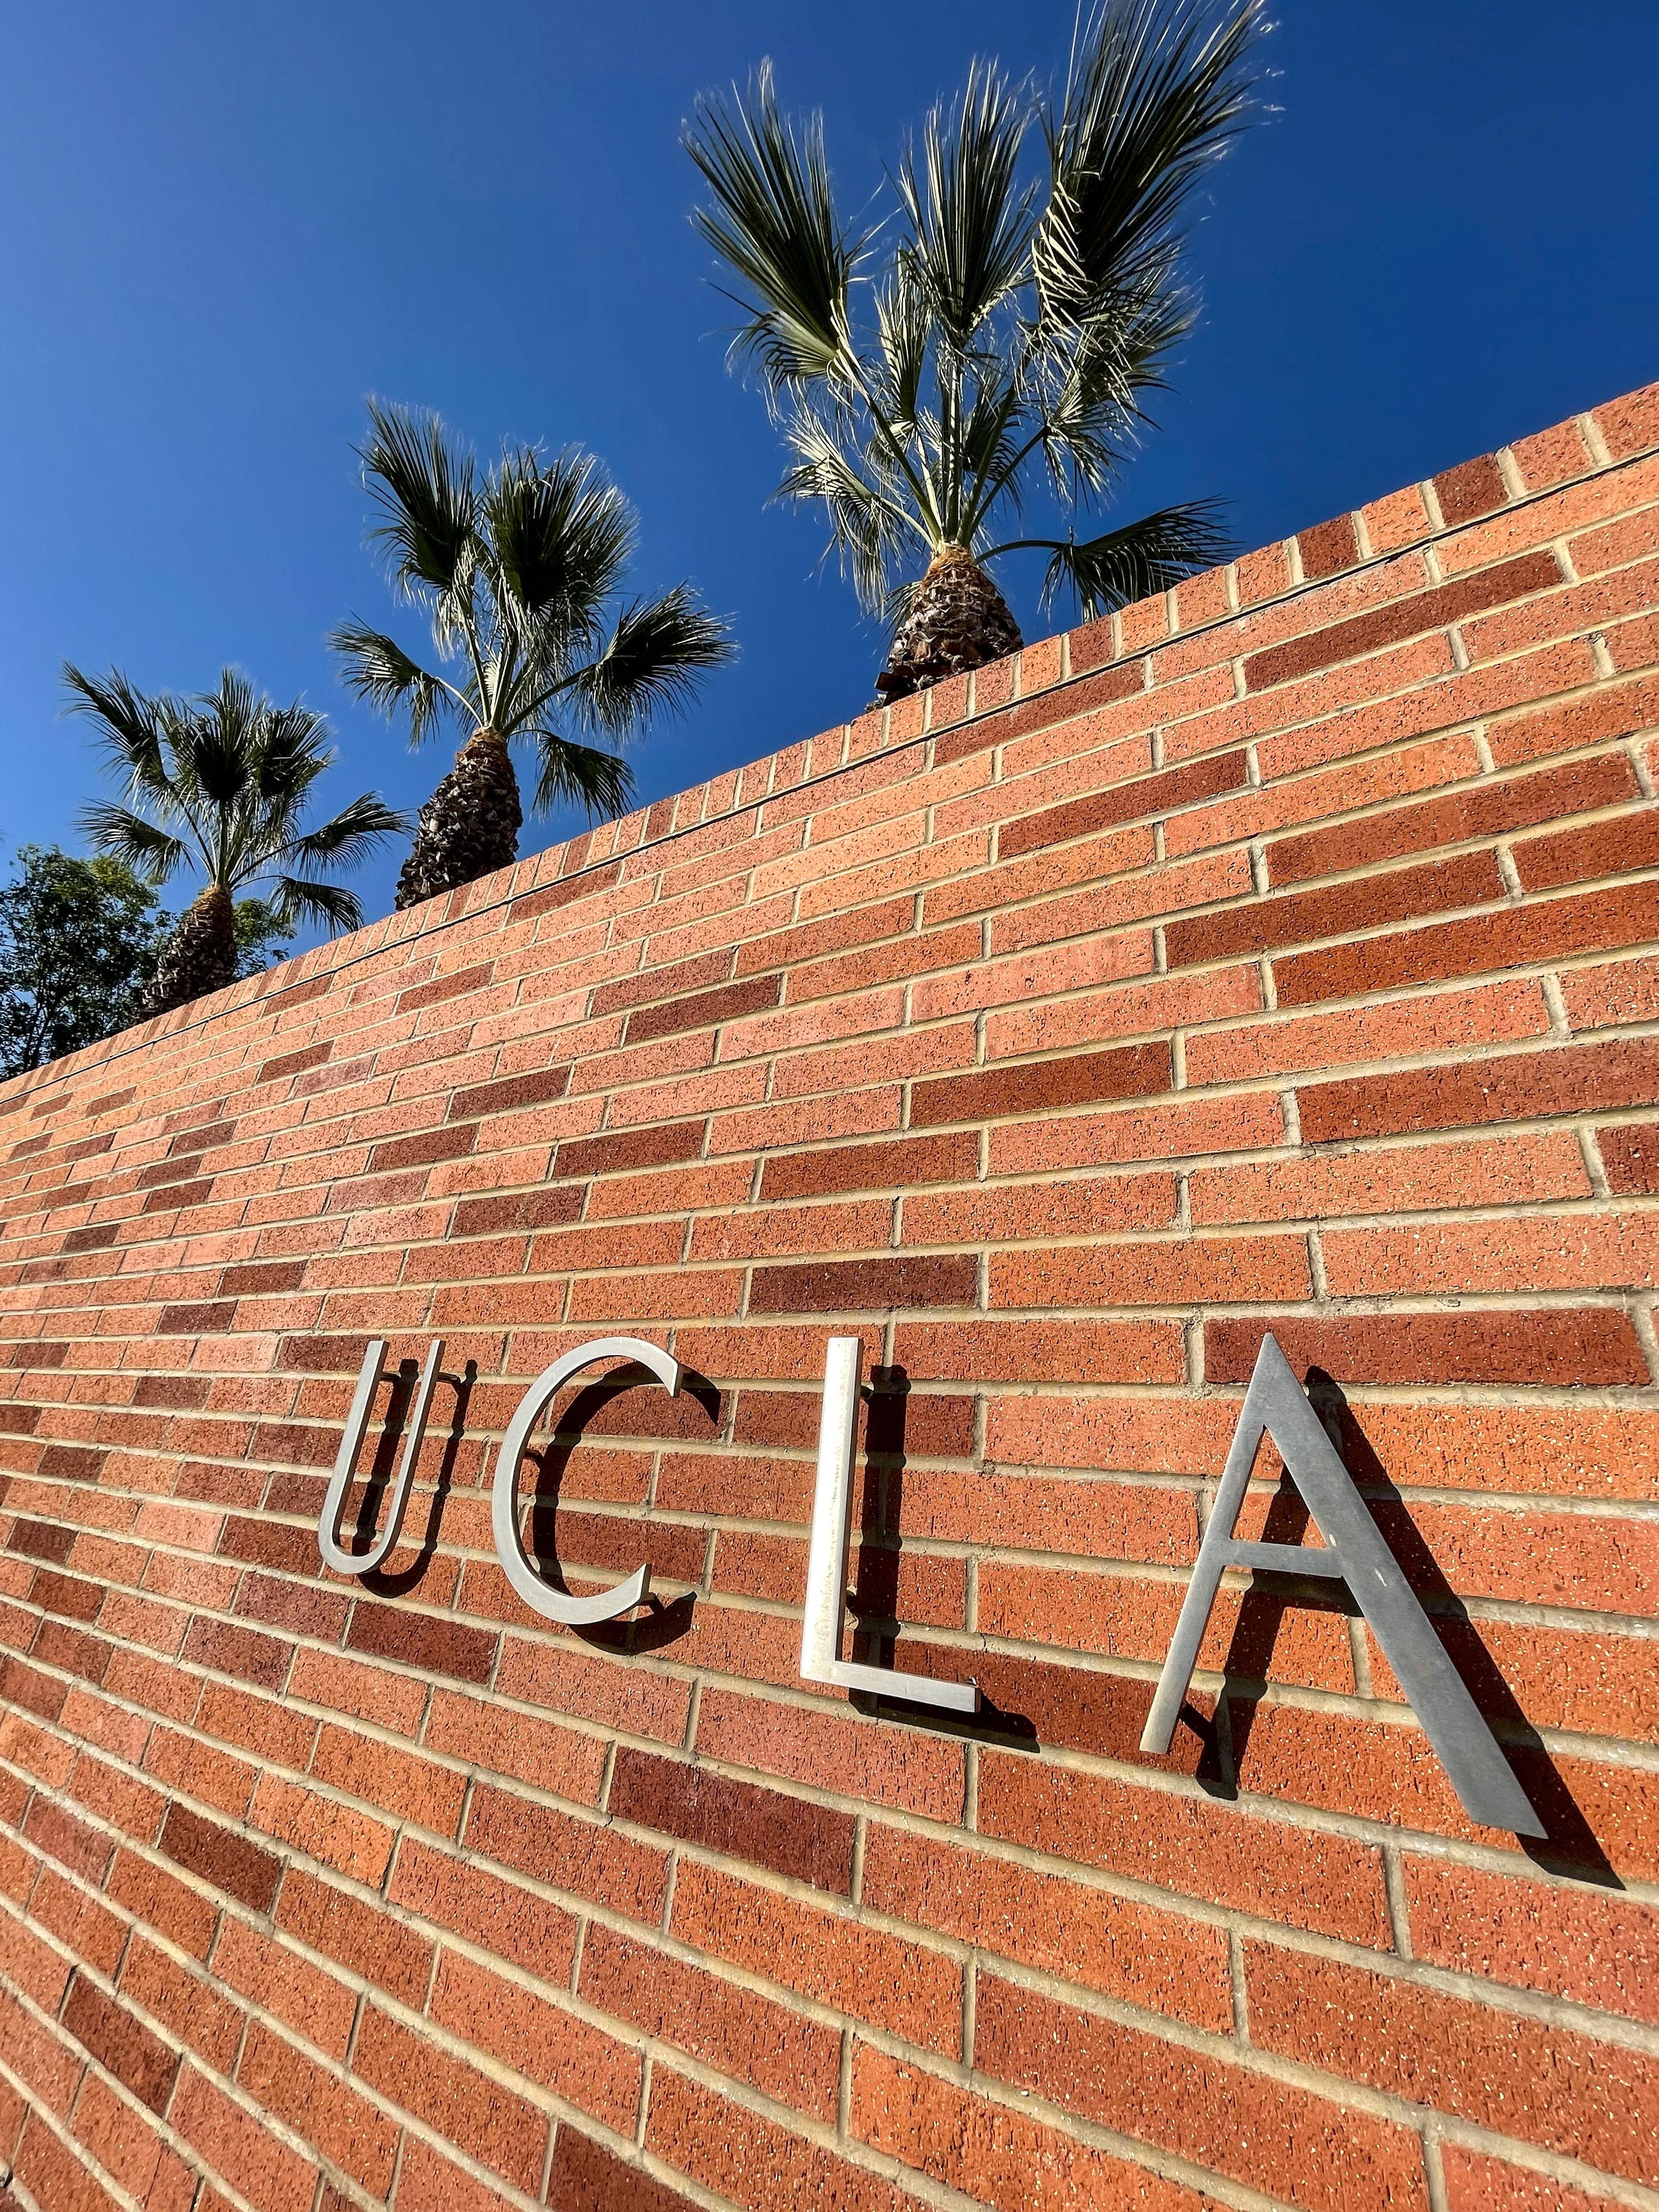 Exploring The University of California, Los Angeles